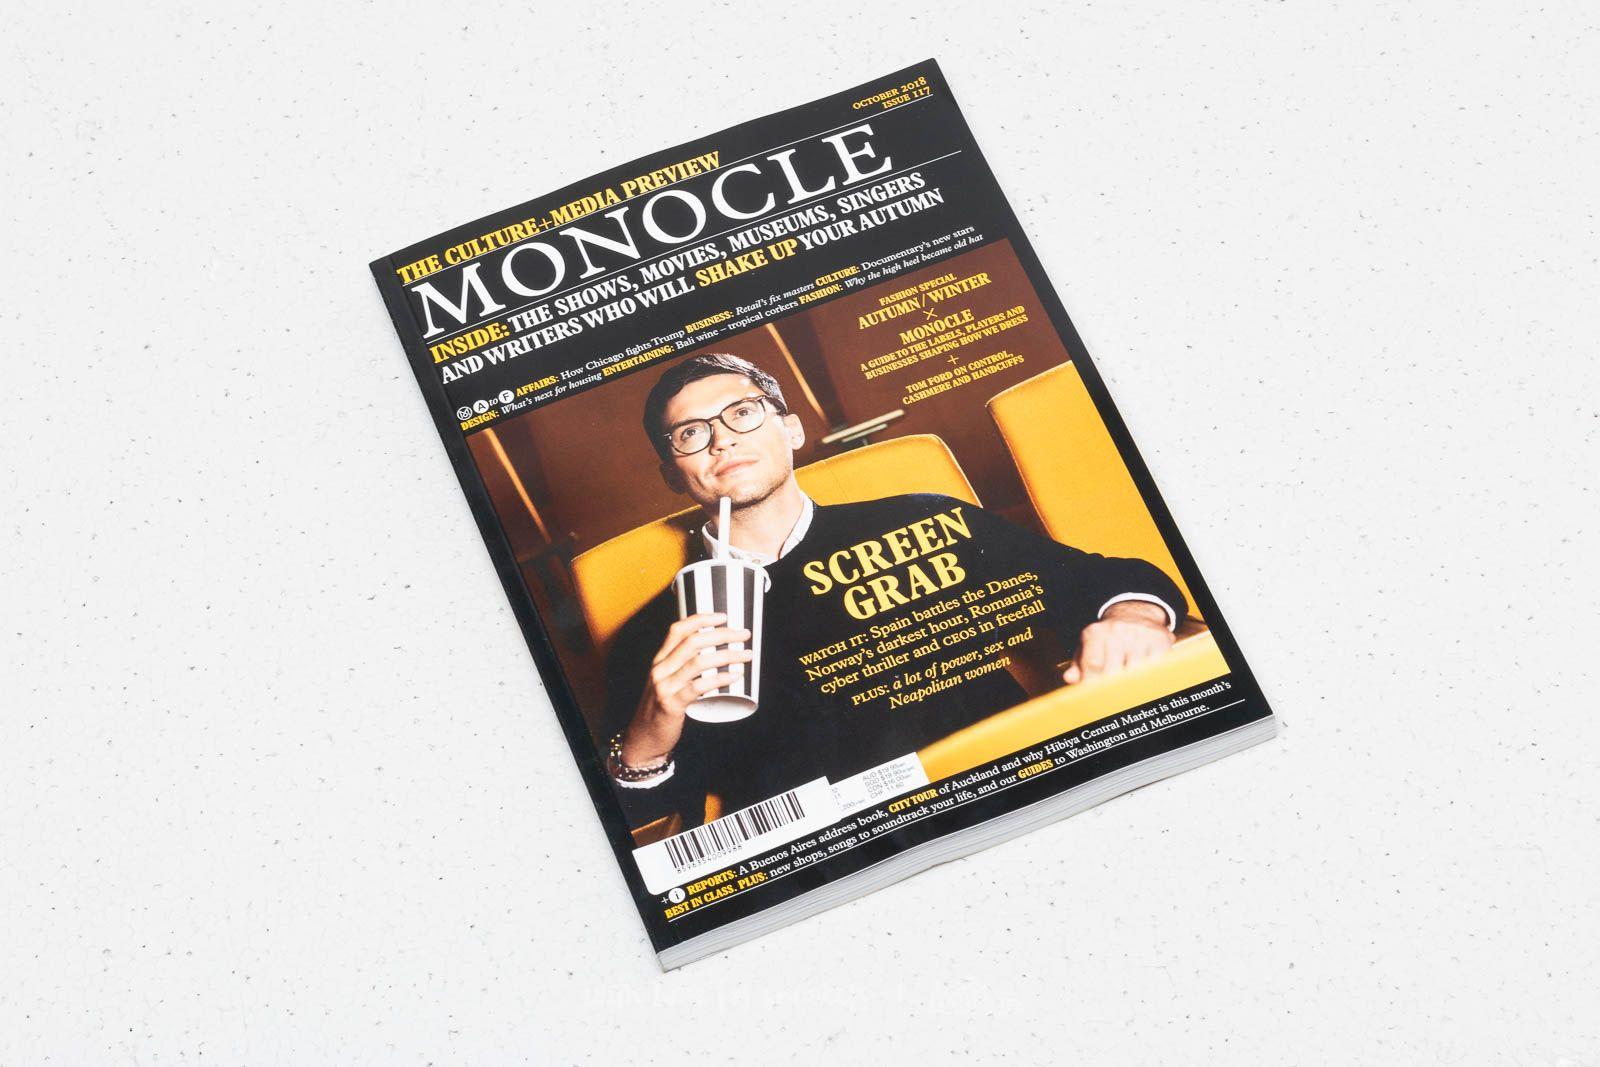 Monocle Magazine October 2018 za skvelú cenu 4 € kúpite na Footshop.sk